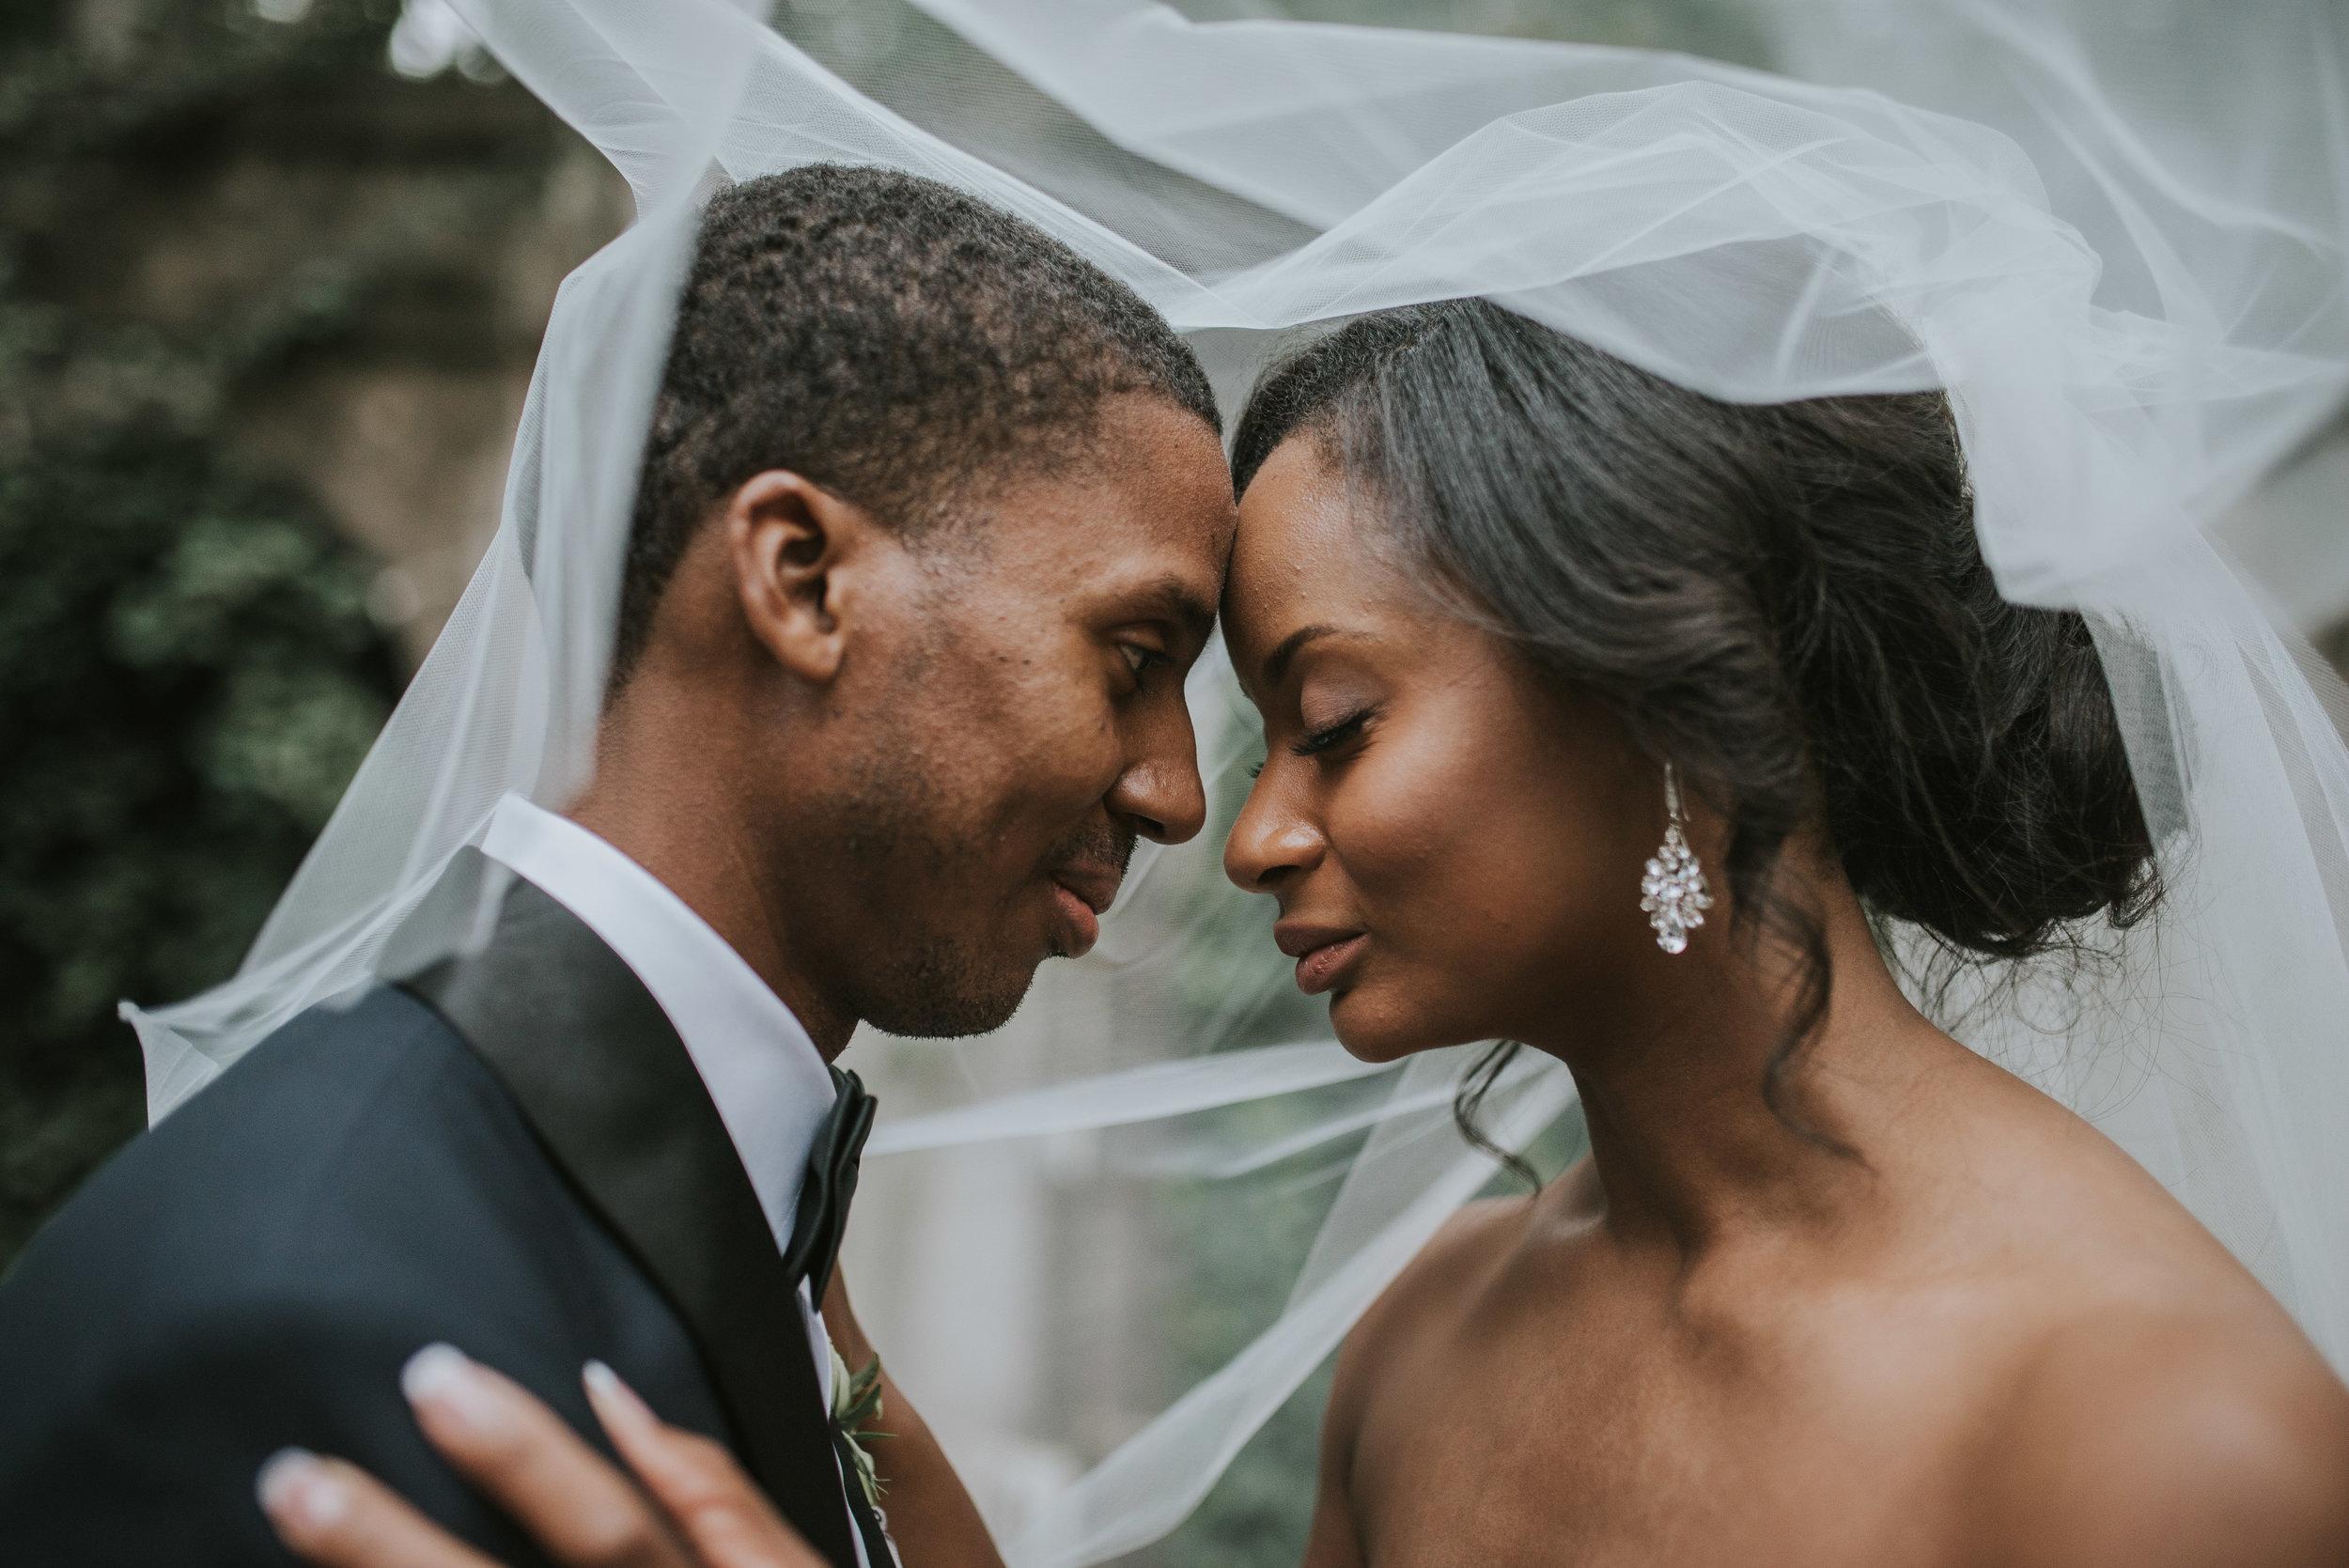 Bride and groom intimate underneath veil